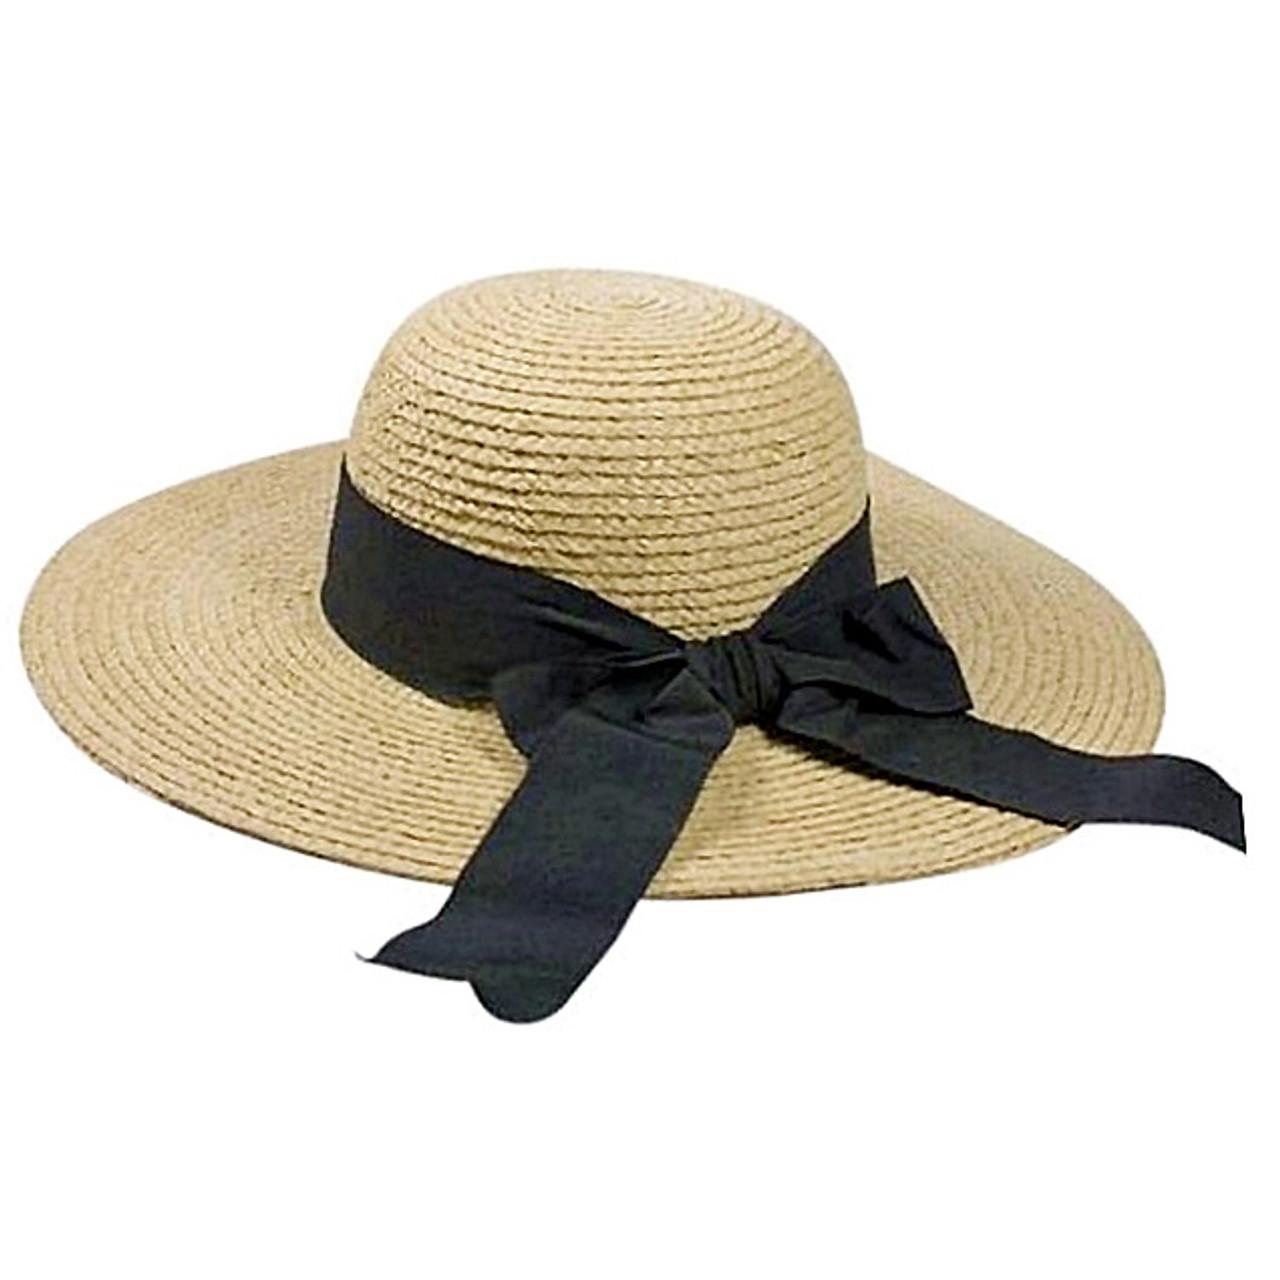 d7ee97f73 Boardwalk Style - Raffia Sun Hat with Ribbon Bow